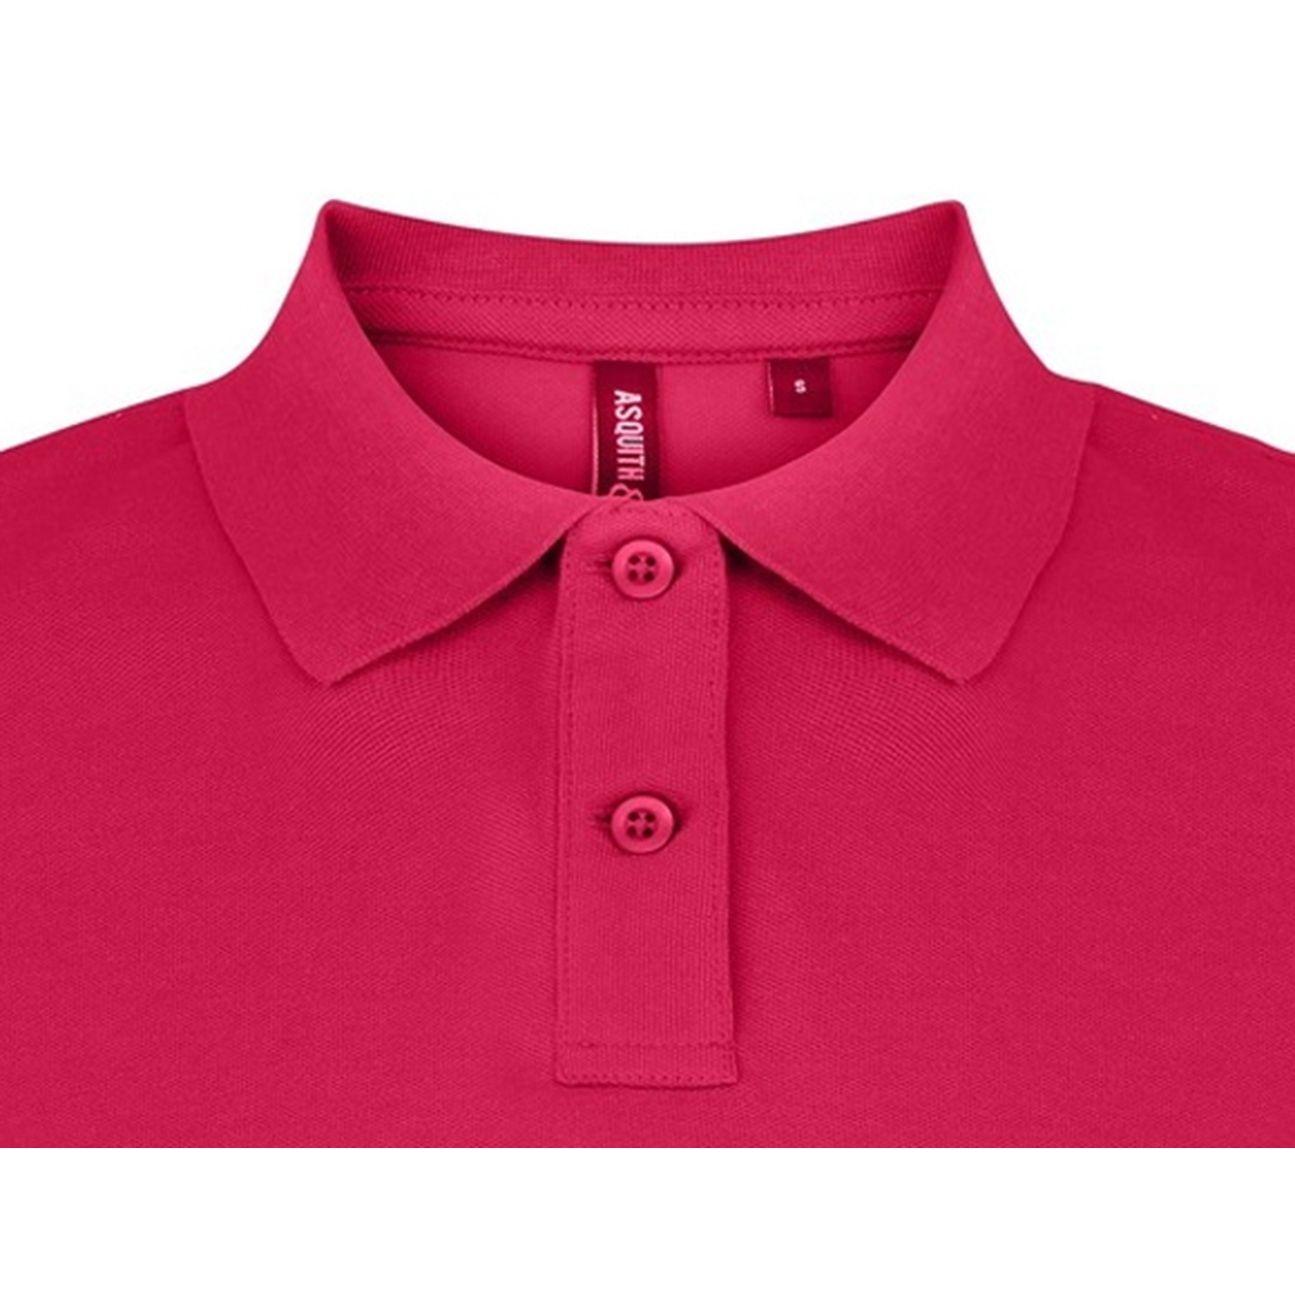 Asquith & Fox Womens/Ladies Plain Short Sleeve Polo Shirt (Hot Pink)